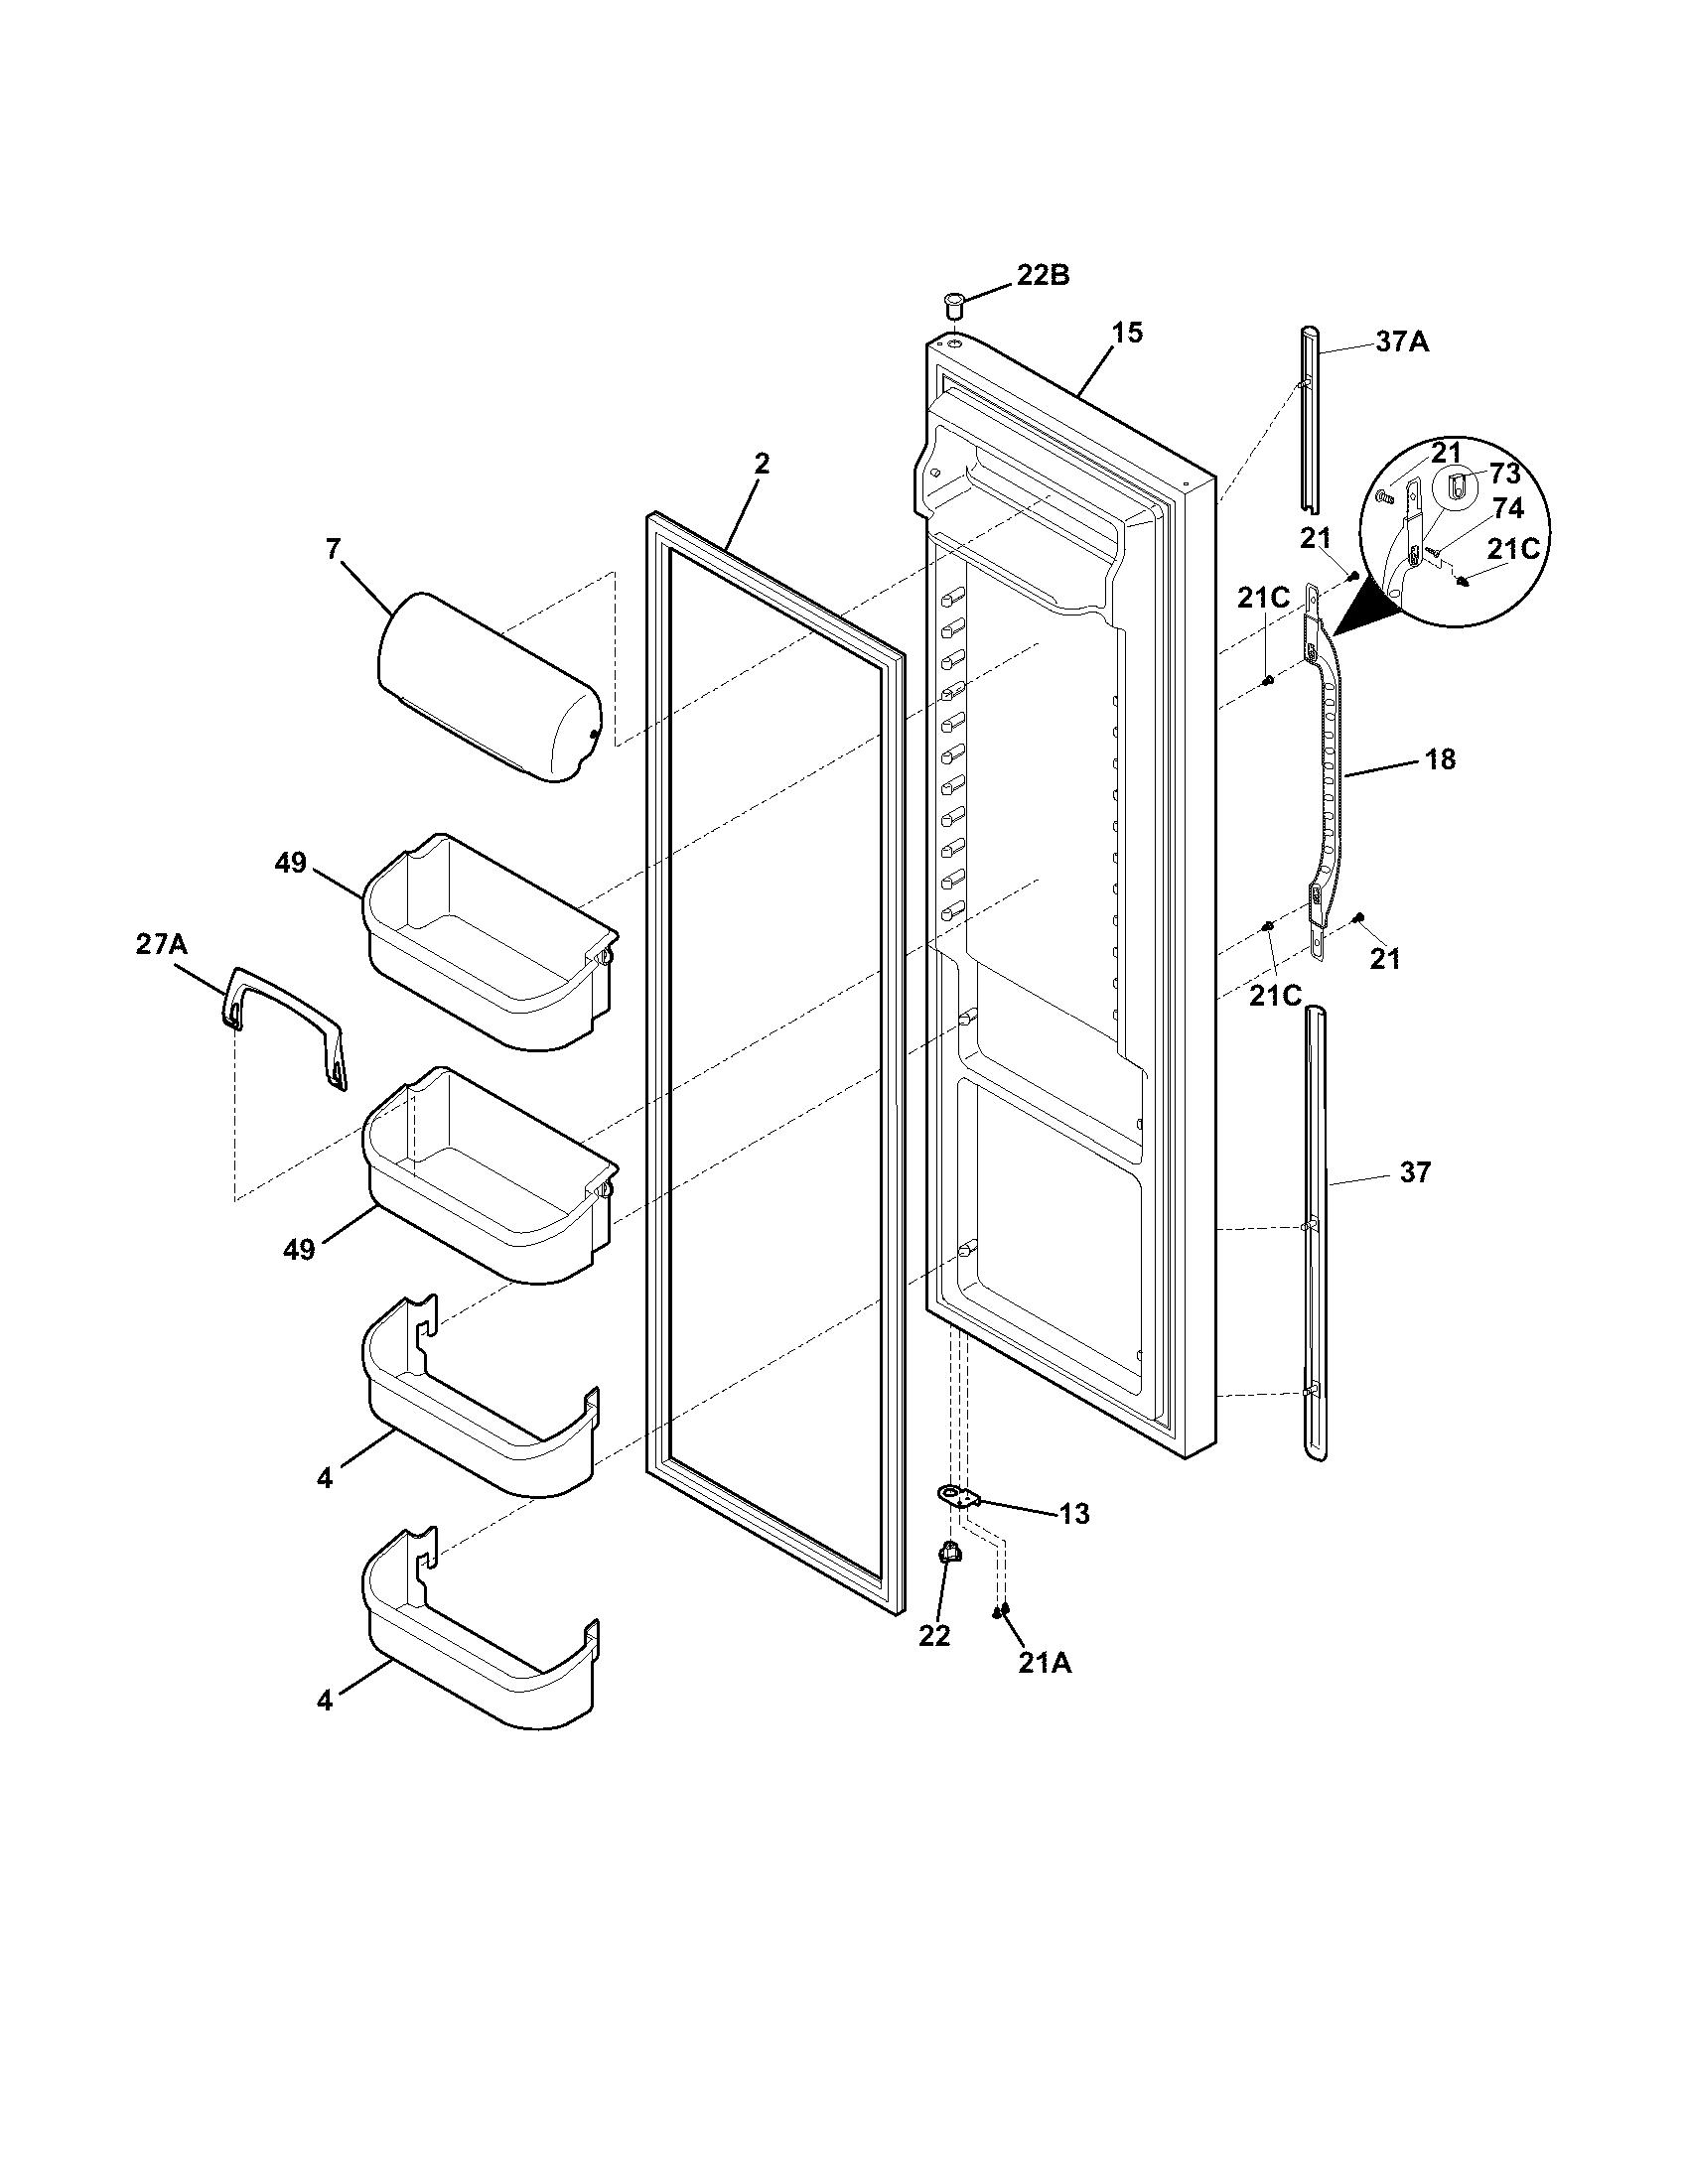 Refrigerator Door Diagram Parts List For Model 25356522400